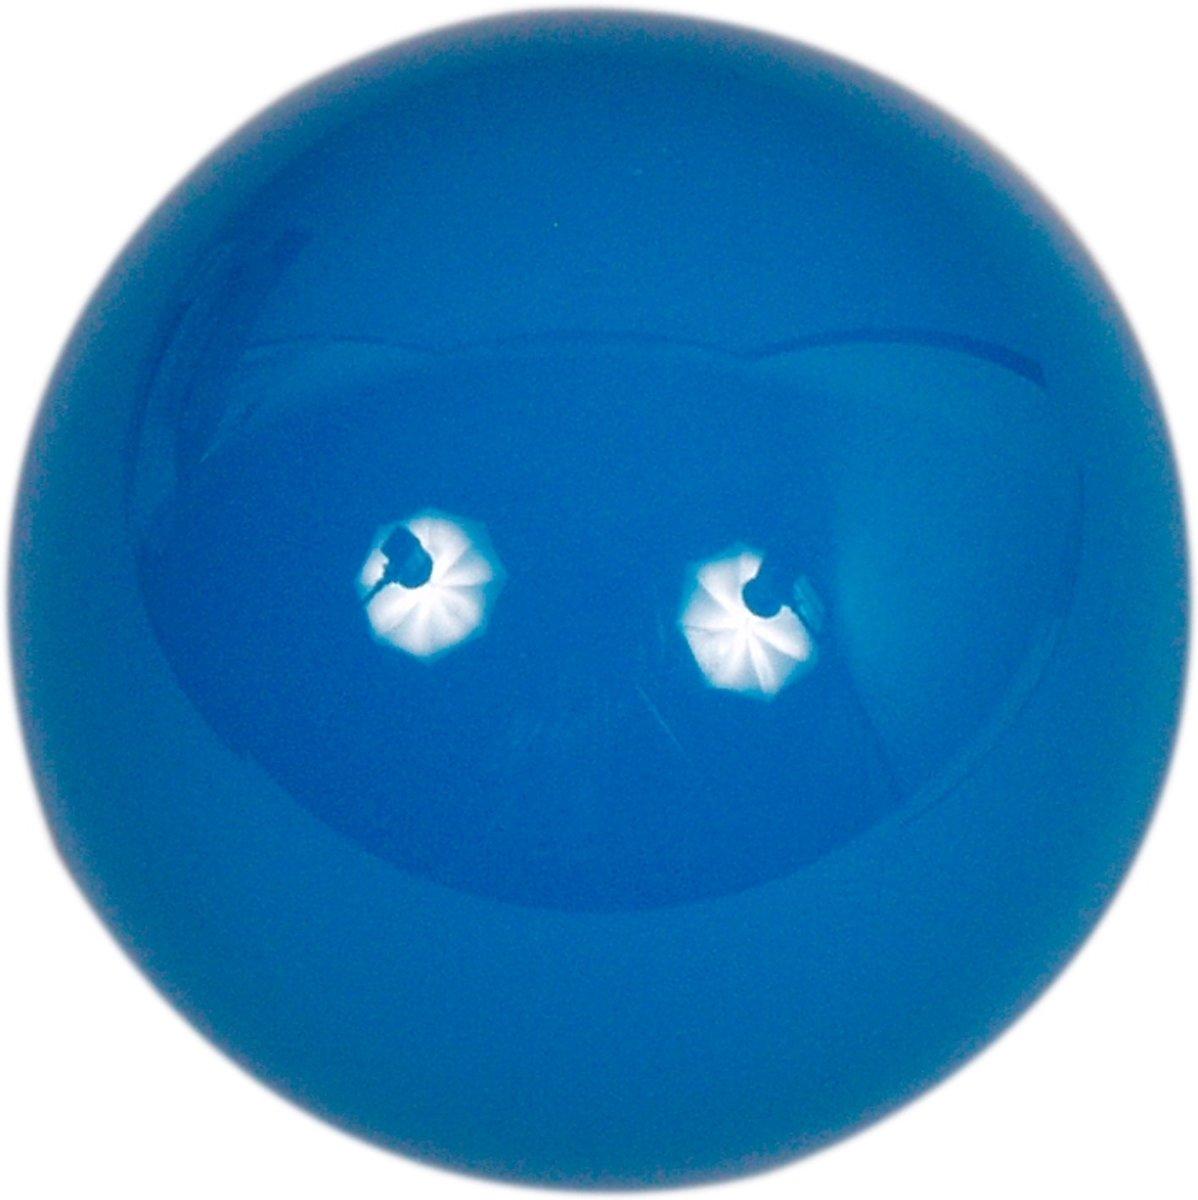 Snooker bal Aramith 52.4mm blauw kopen